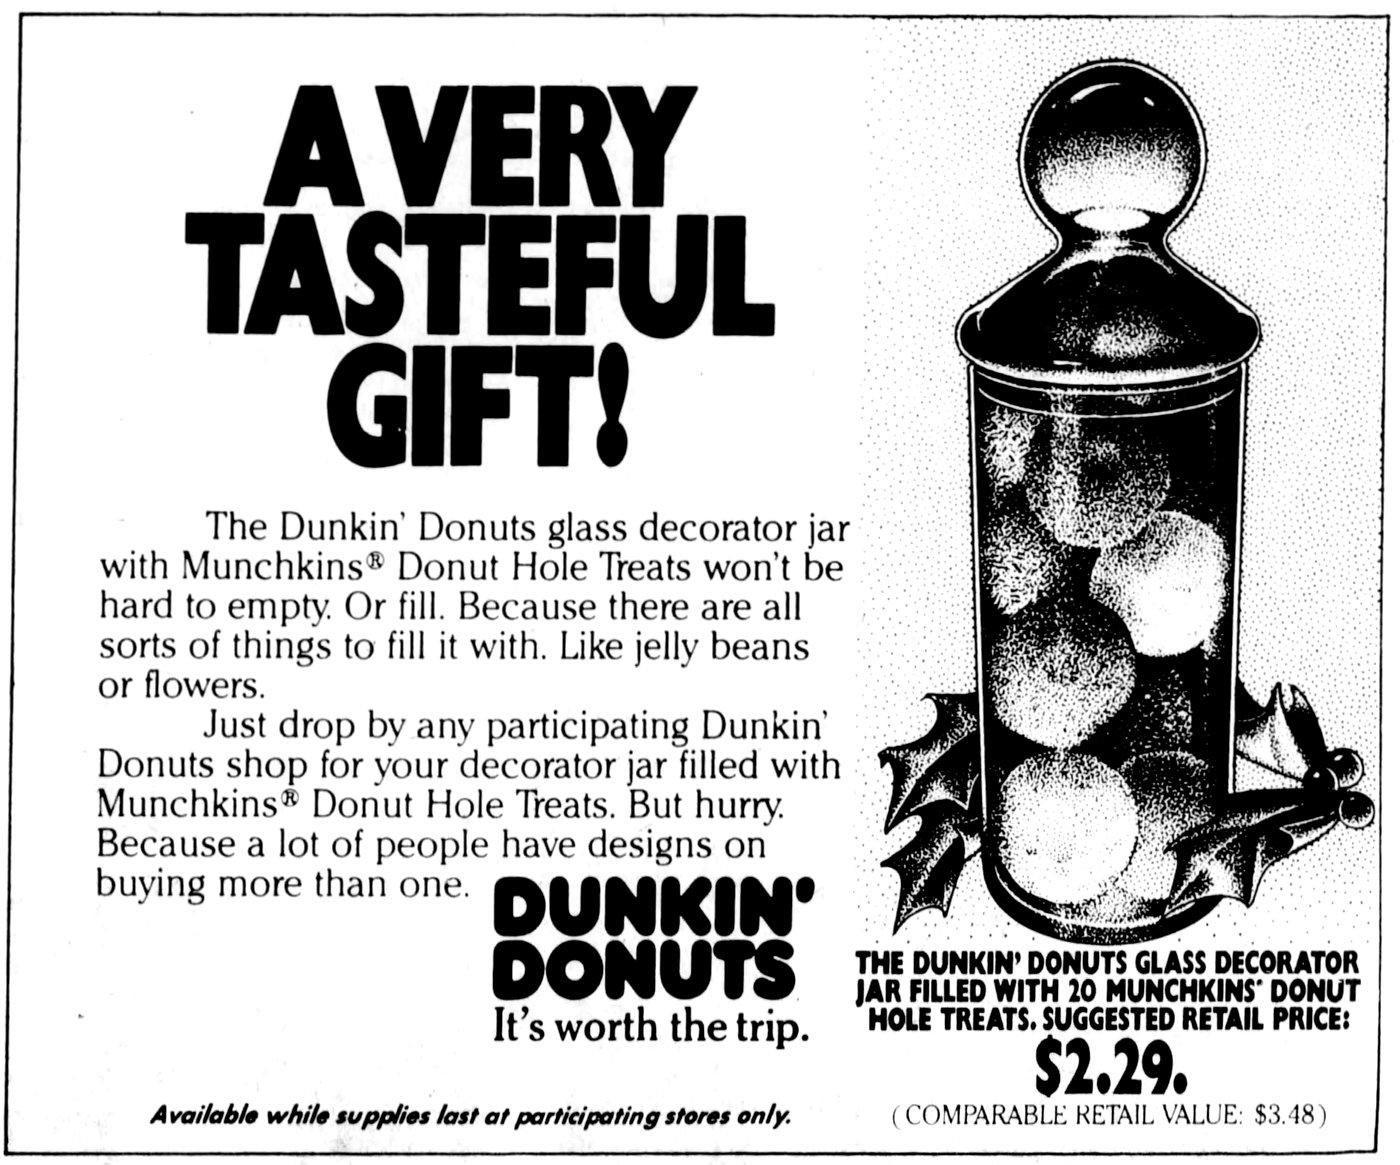 Vintage Dunkin Donuts glass decorator jar gift (1981)